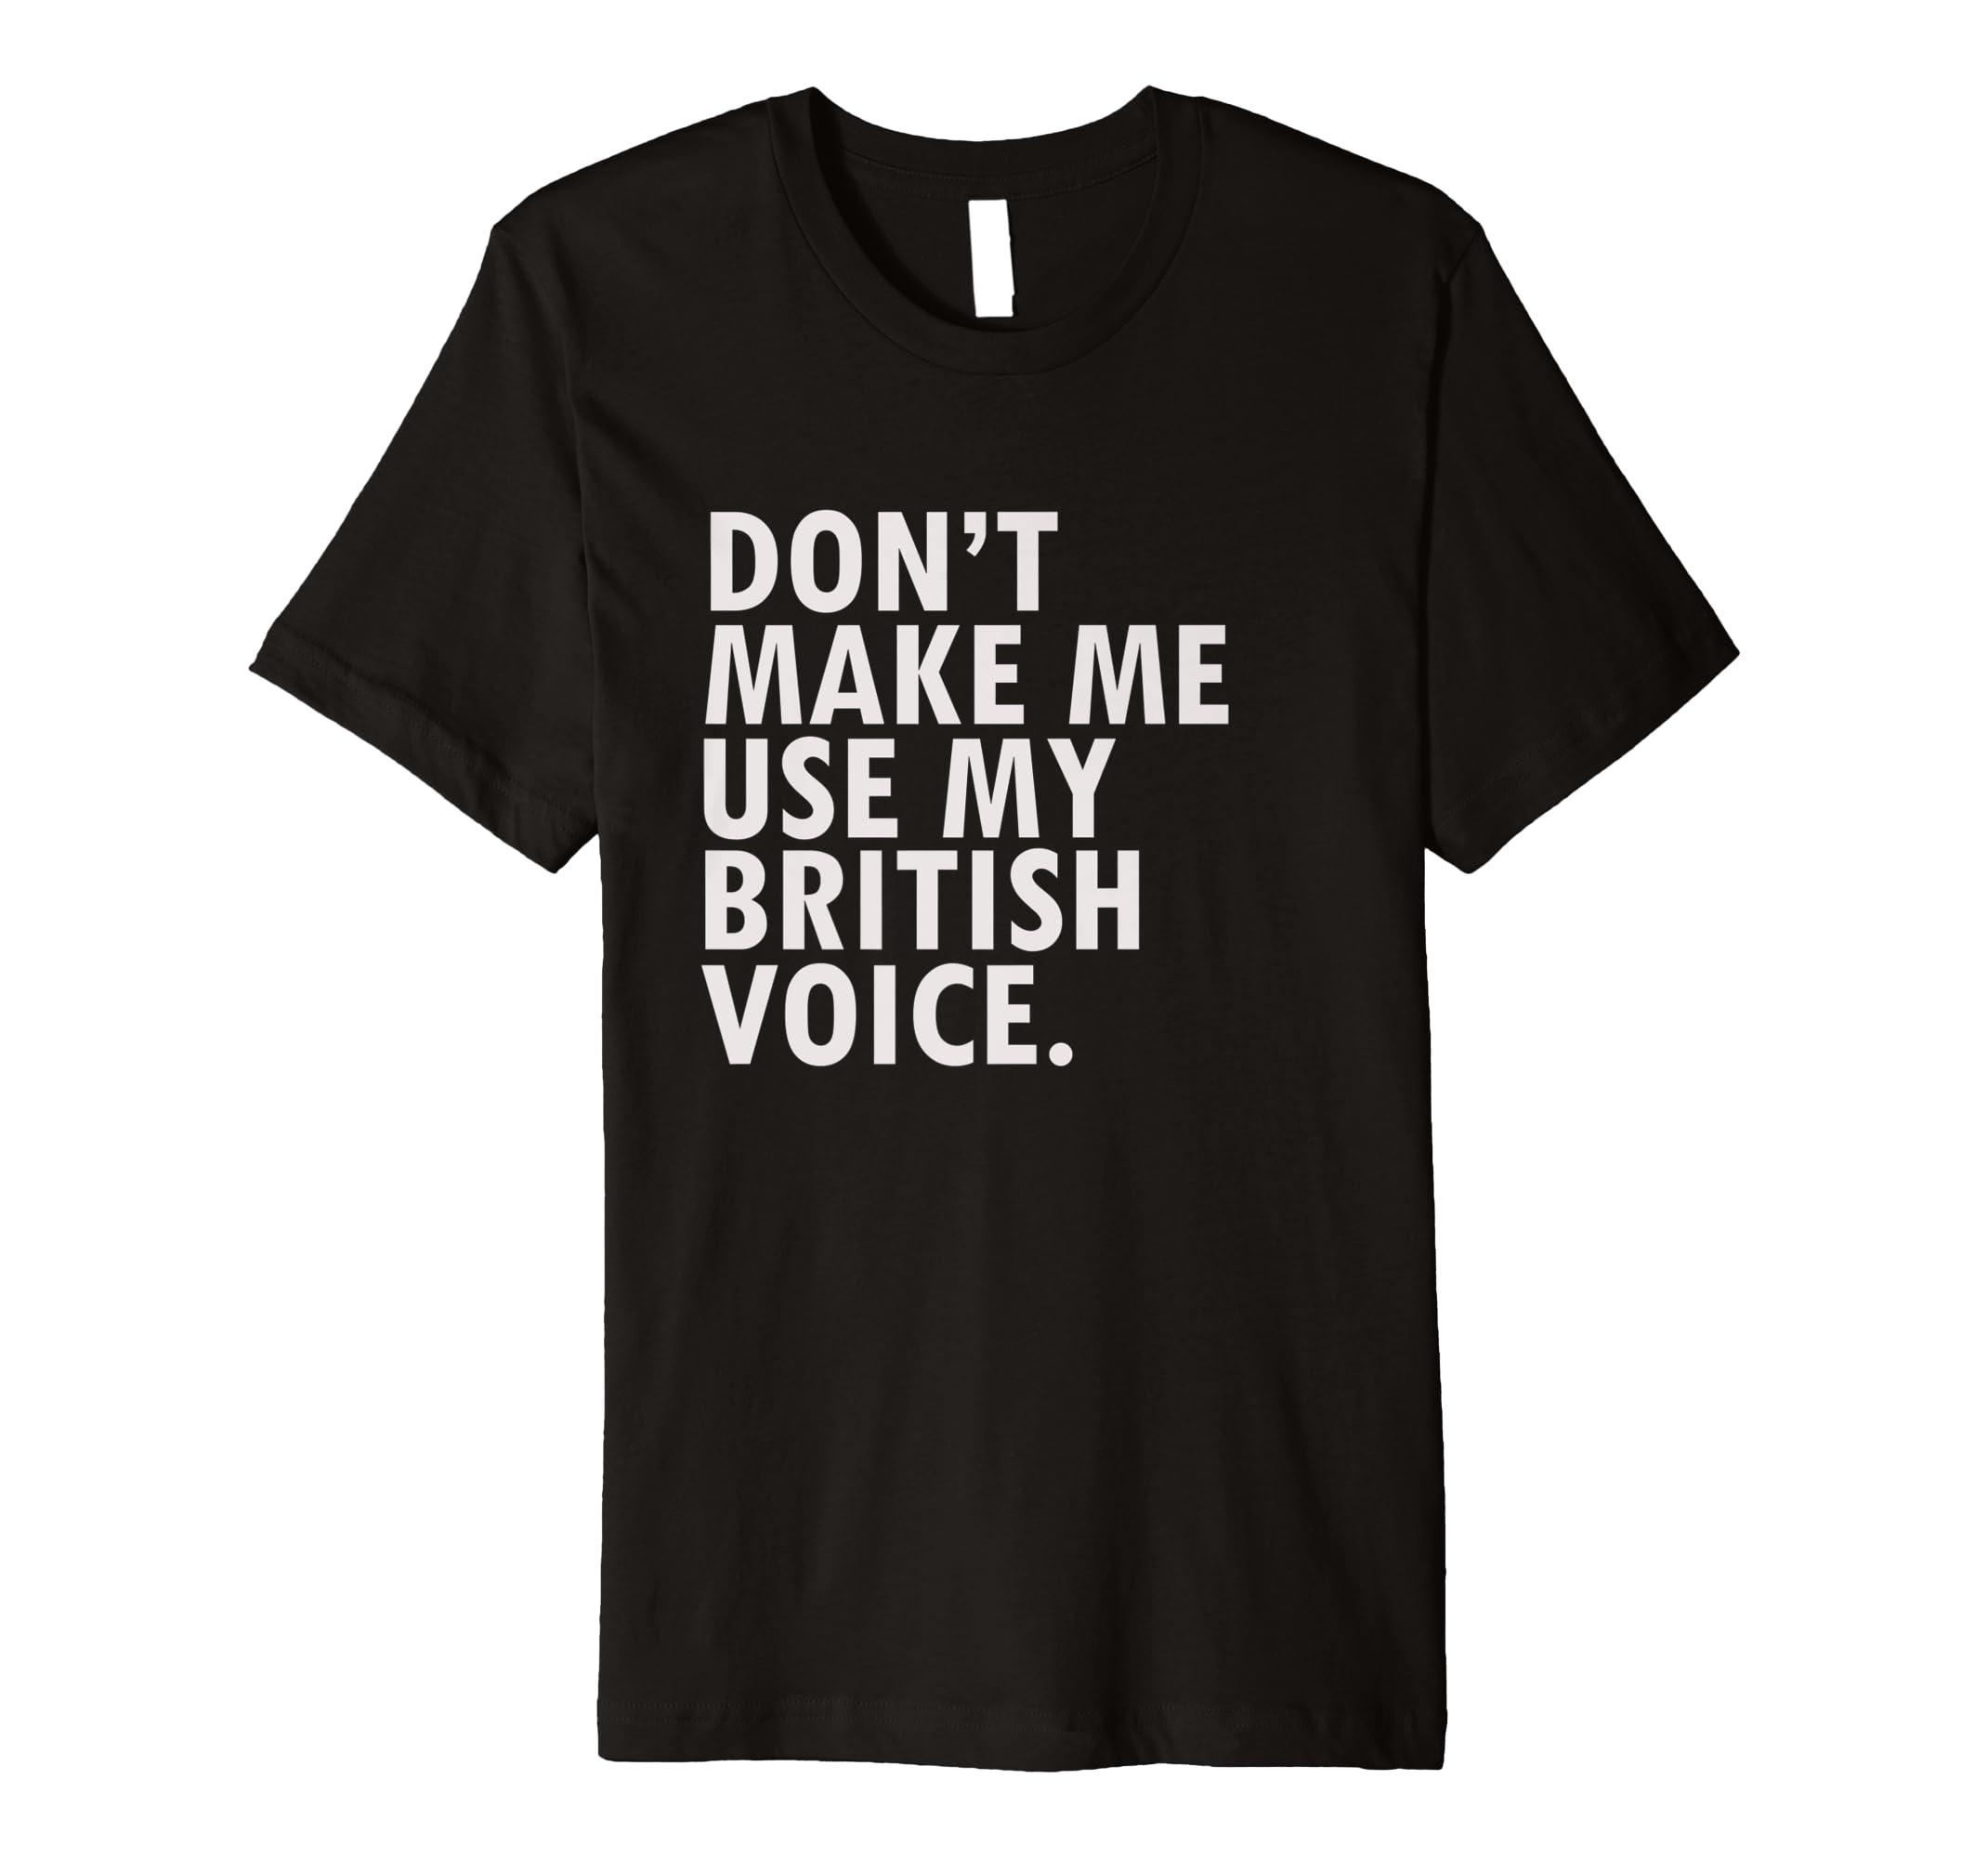 d2121ac31 Amazon.com: Funny British Shirt Tee United Kingdom England T-Shirt: Clothing